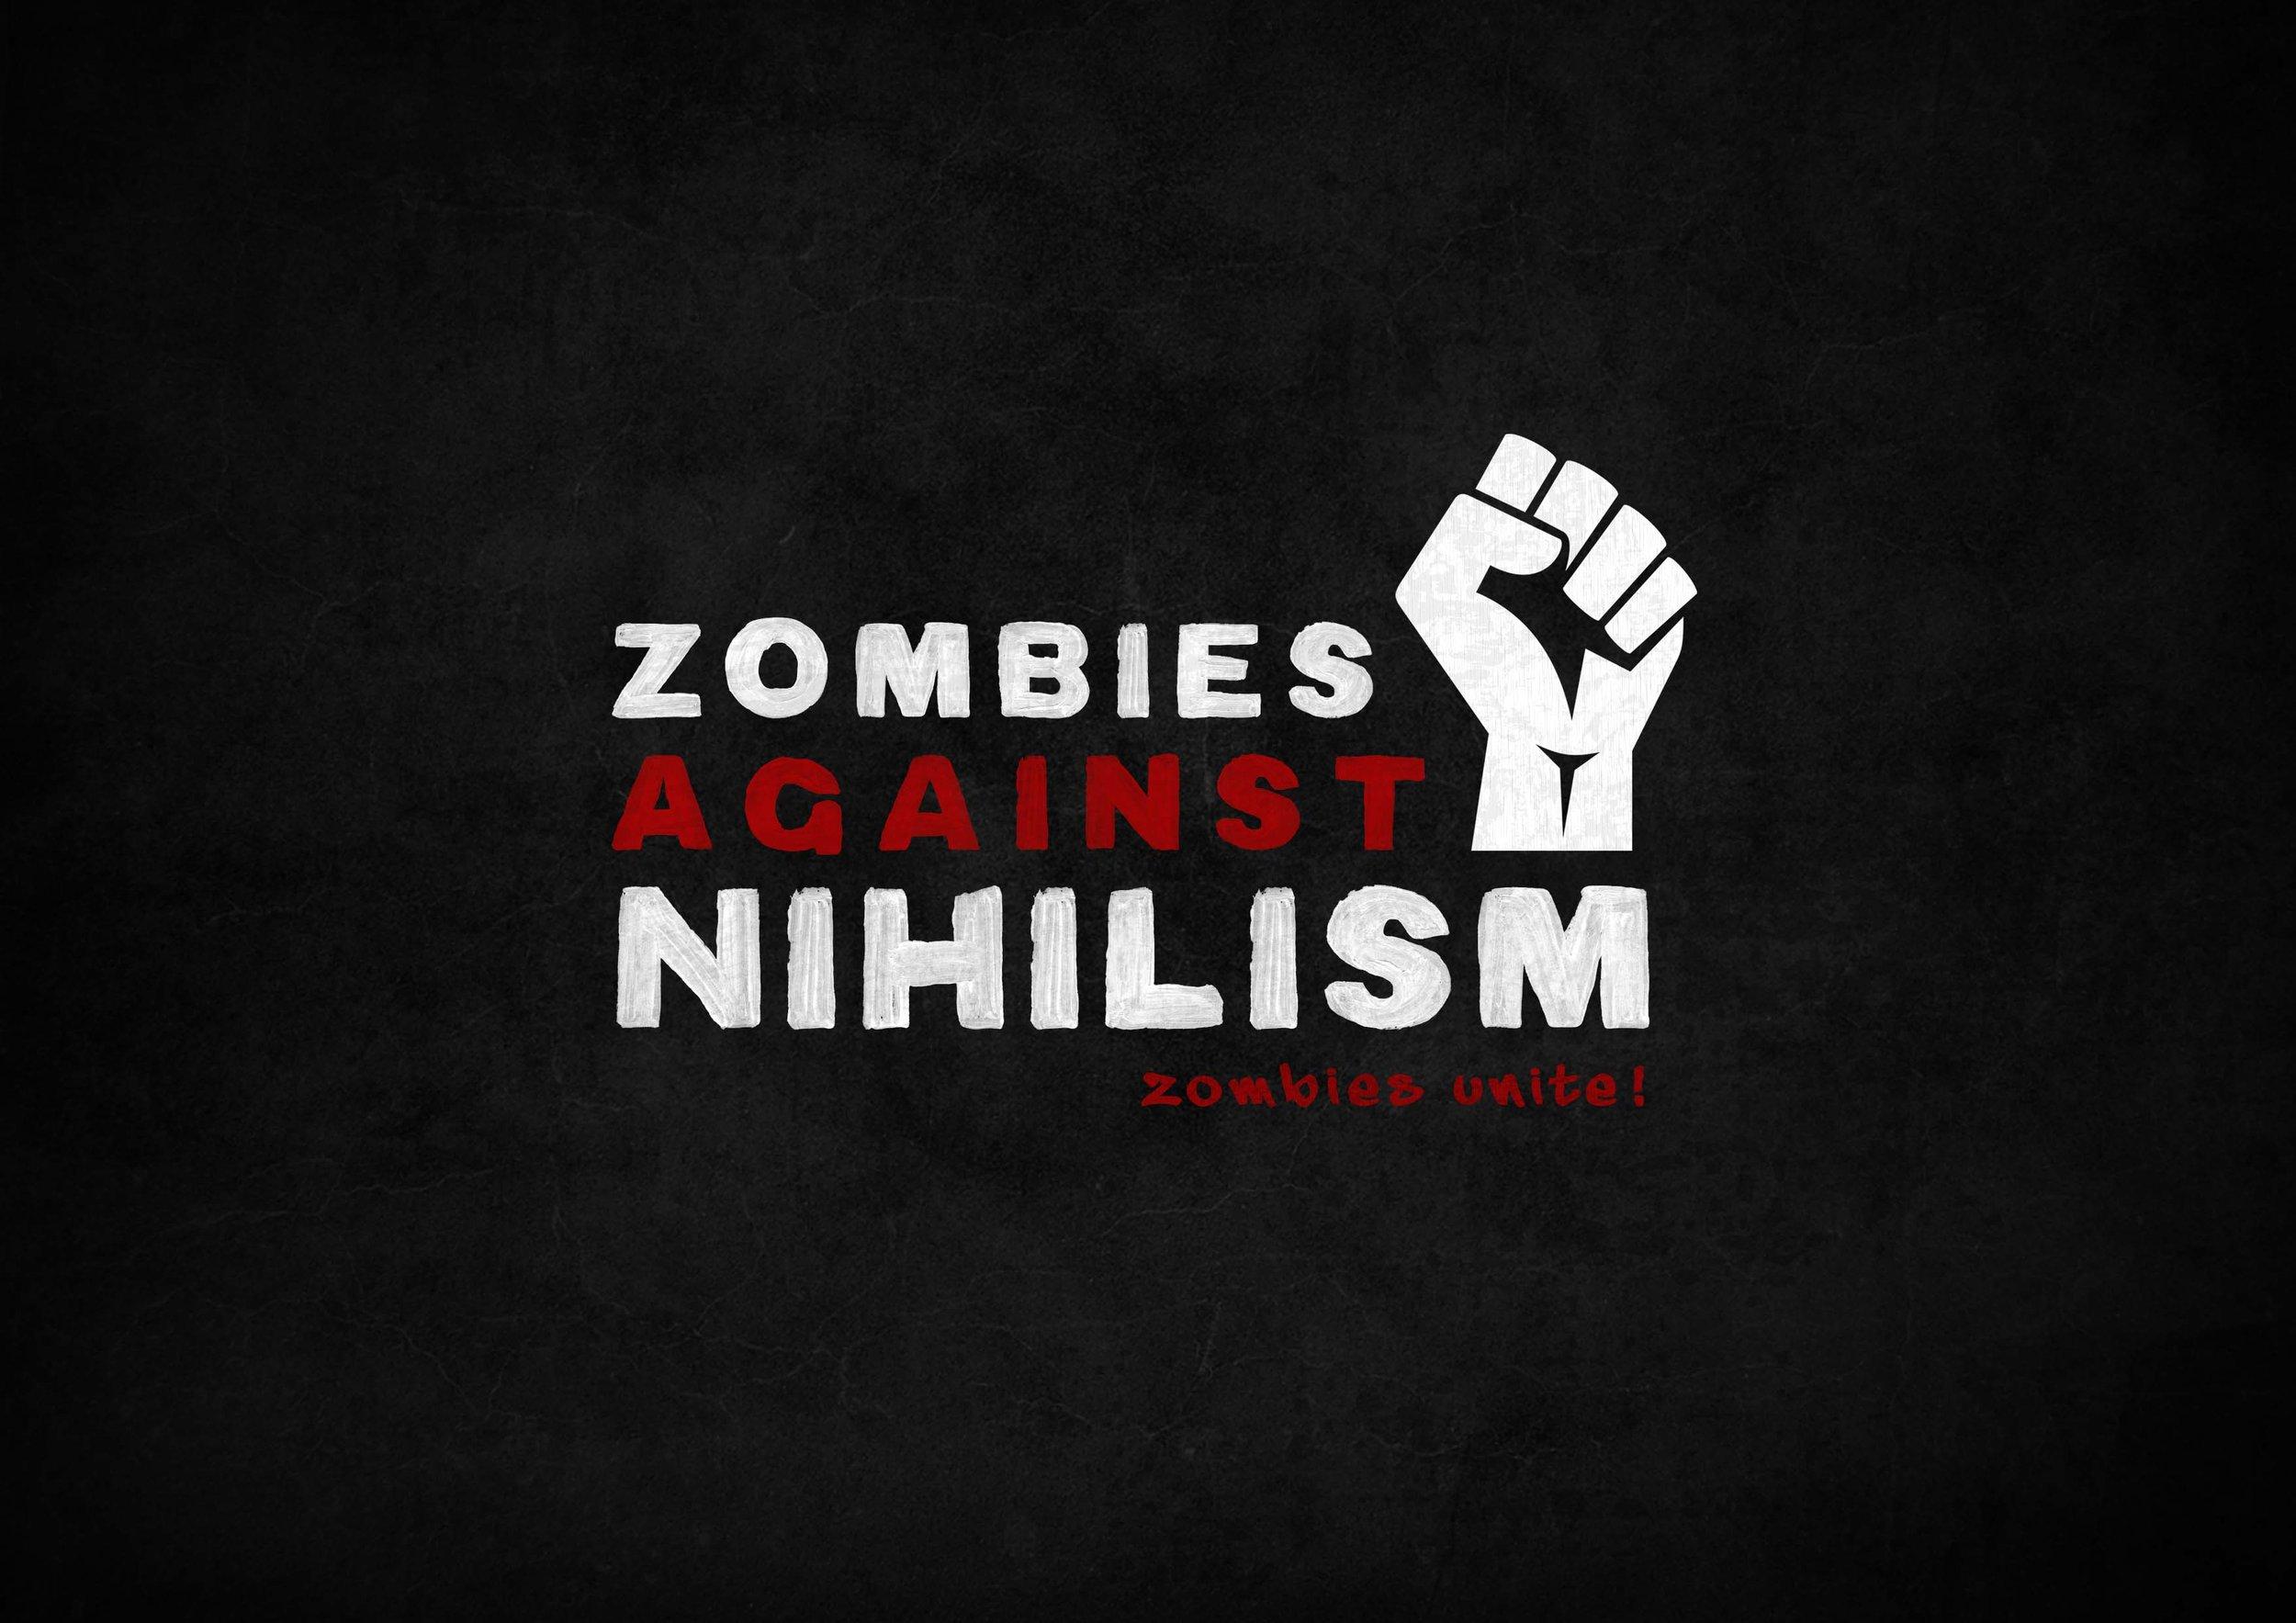 Zombies Unite 01.jpg